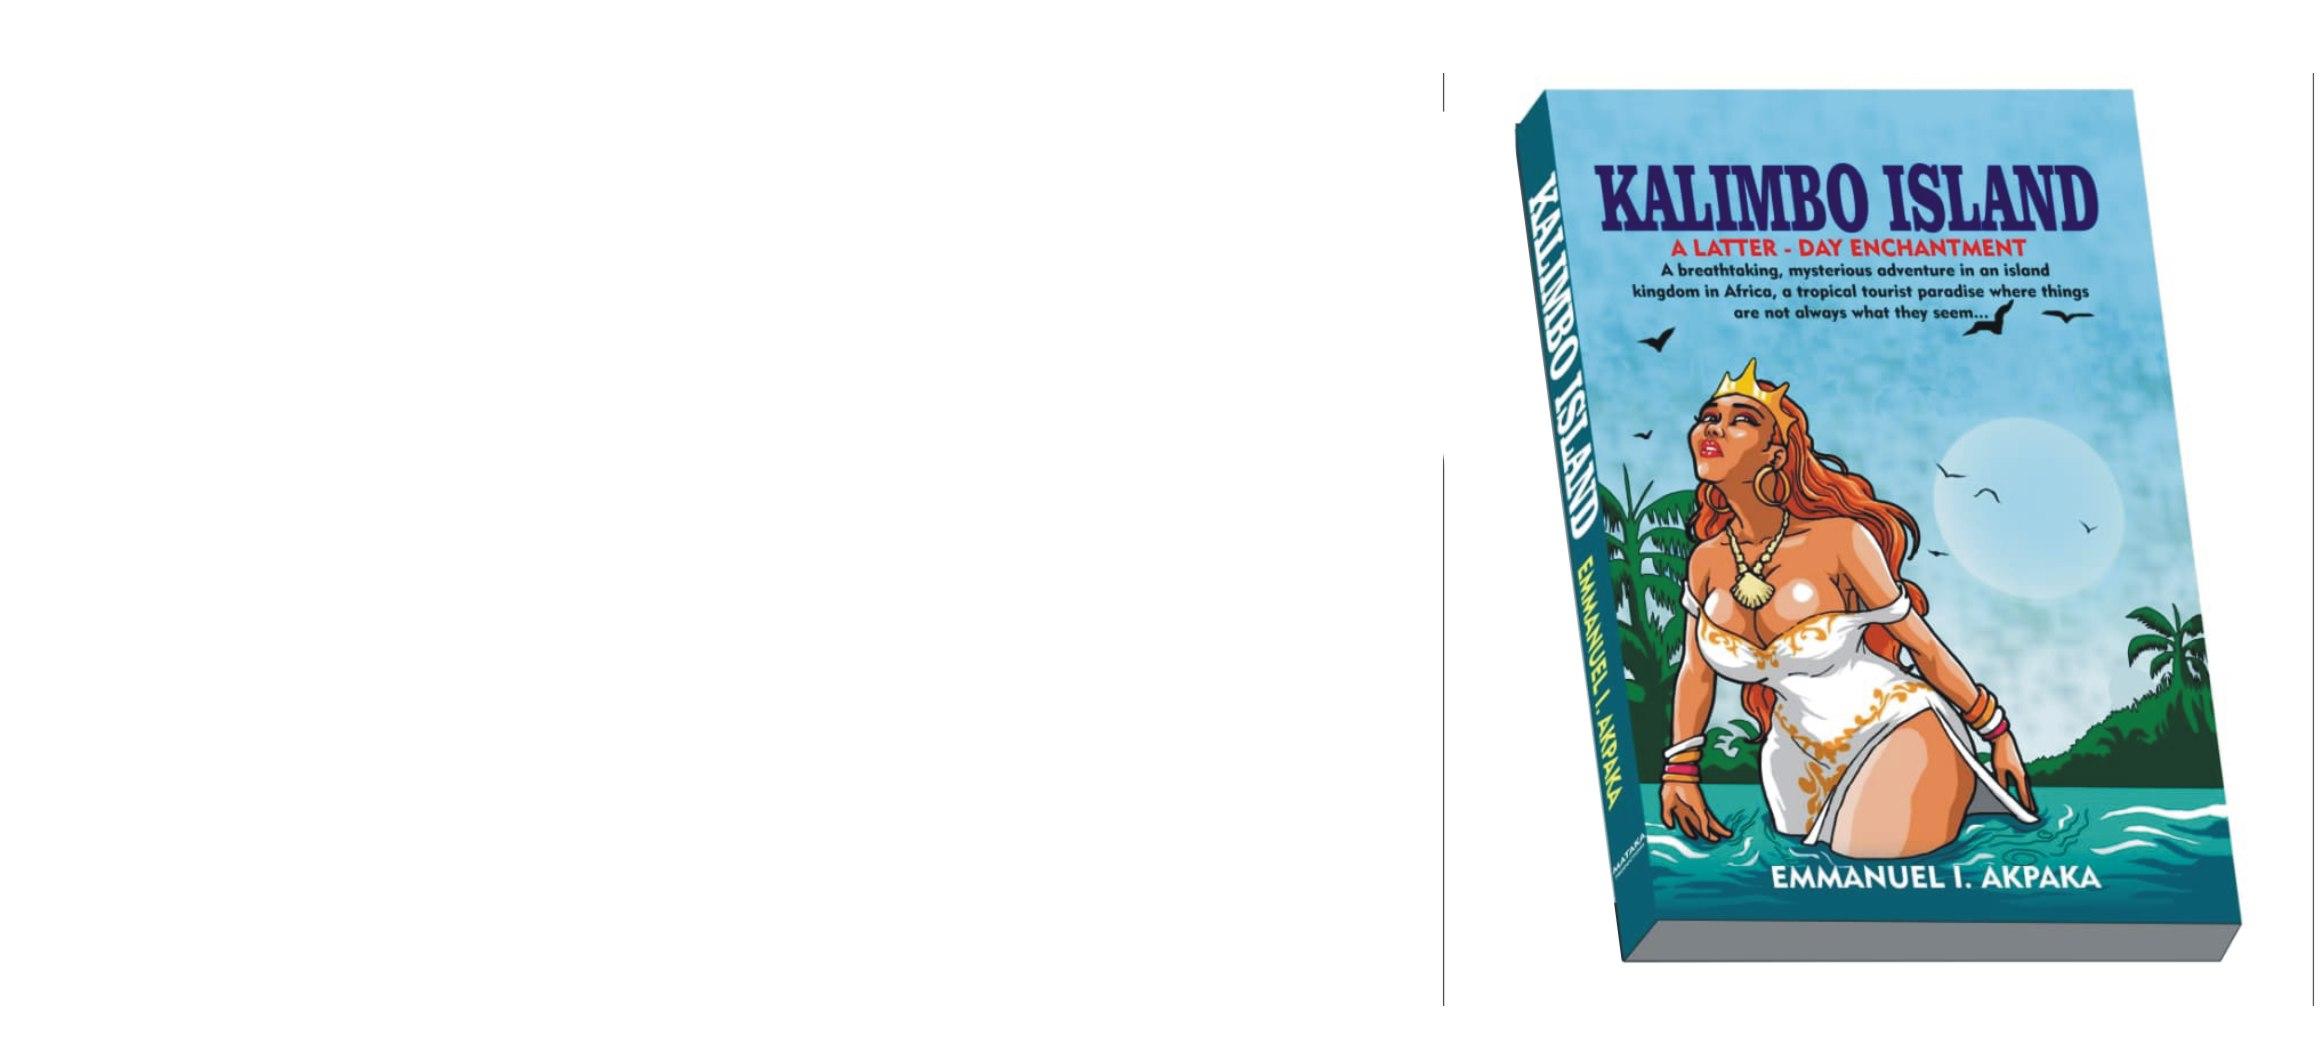 KALIMBO ISLAND